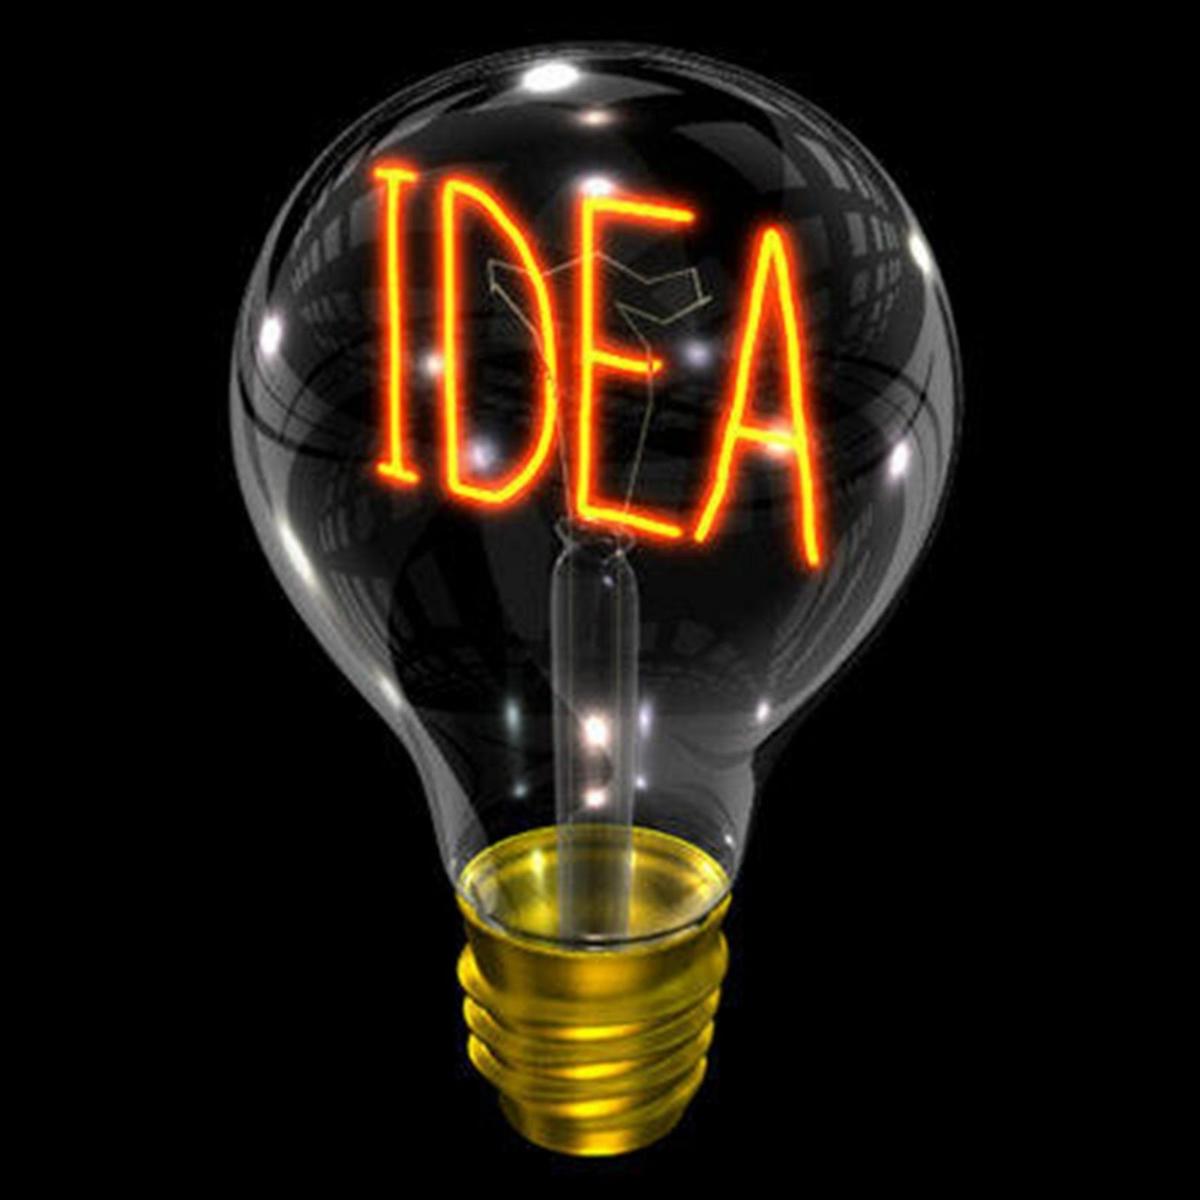 Light bulb idea start-up idea